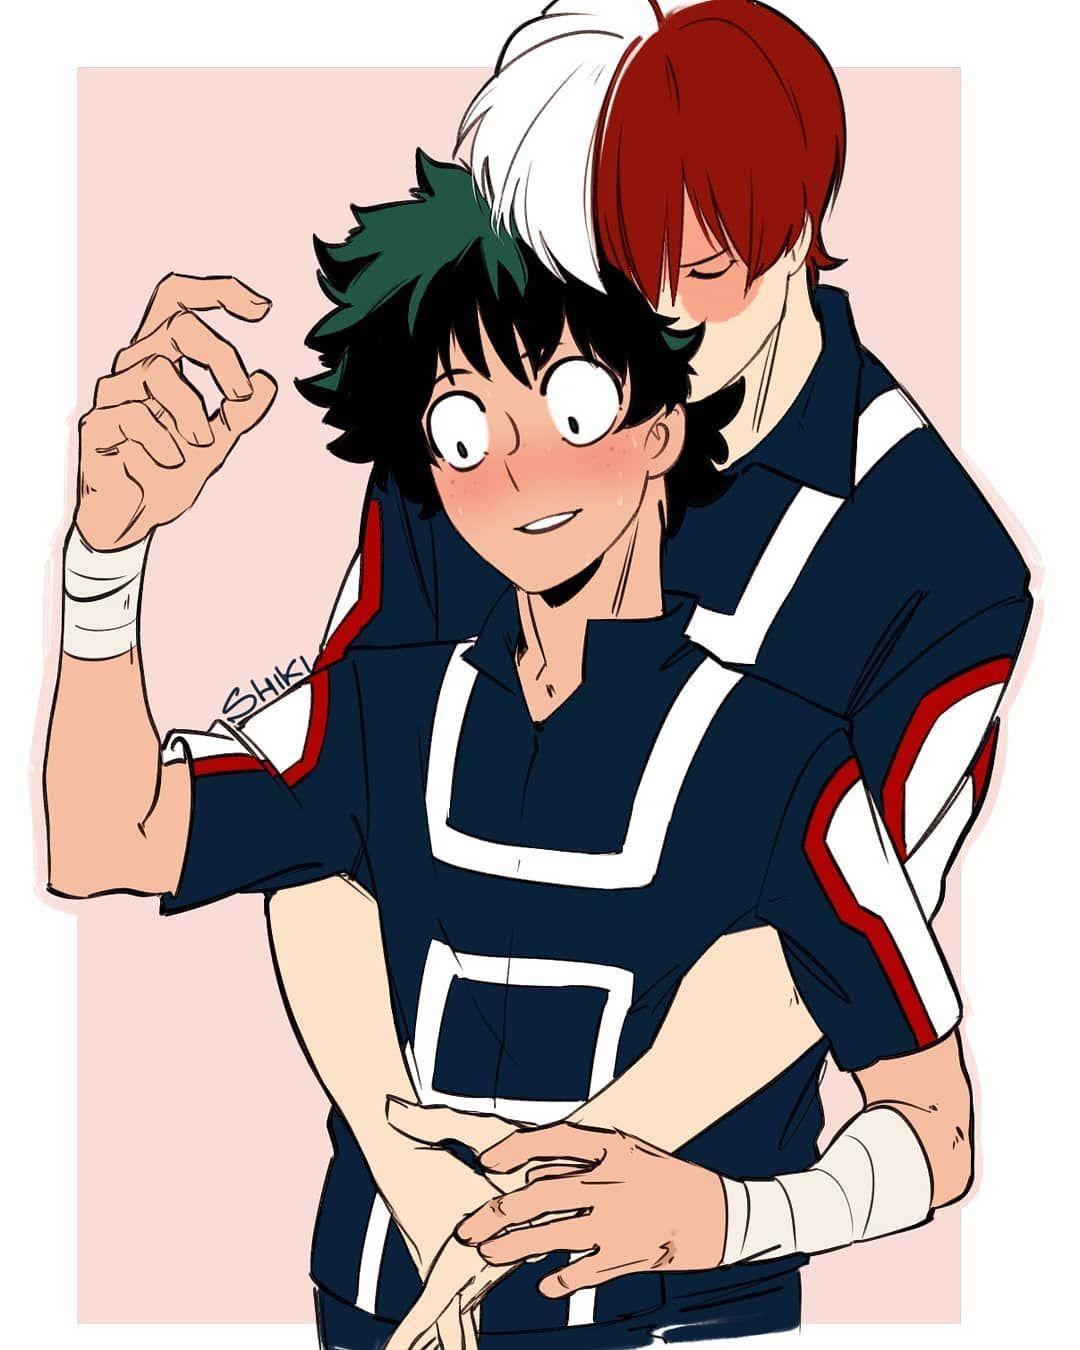 Anime Art Fanart Drawing Sketch Bnha Bokunoheroacademia Izuku Midoriya Izukumidoriya Deku Tododeku Todoroki Hero My Hero My Hero Academia Shouto